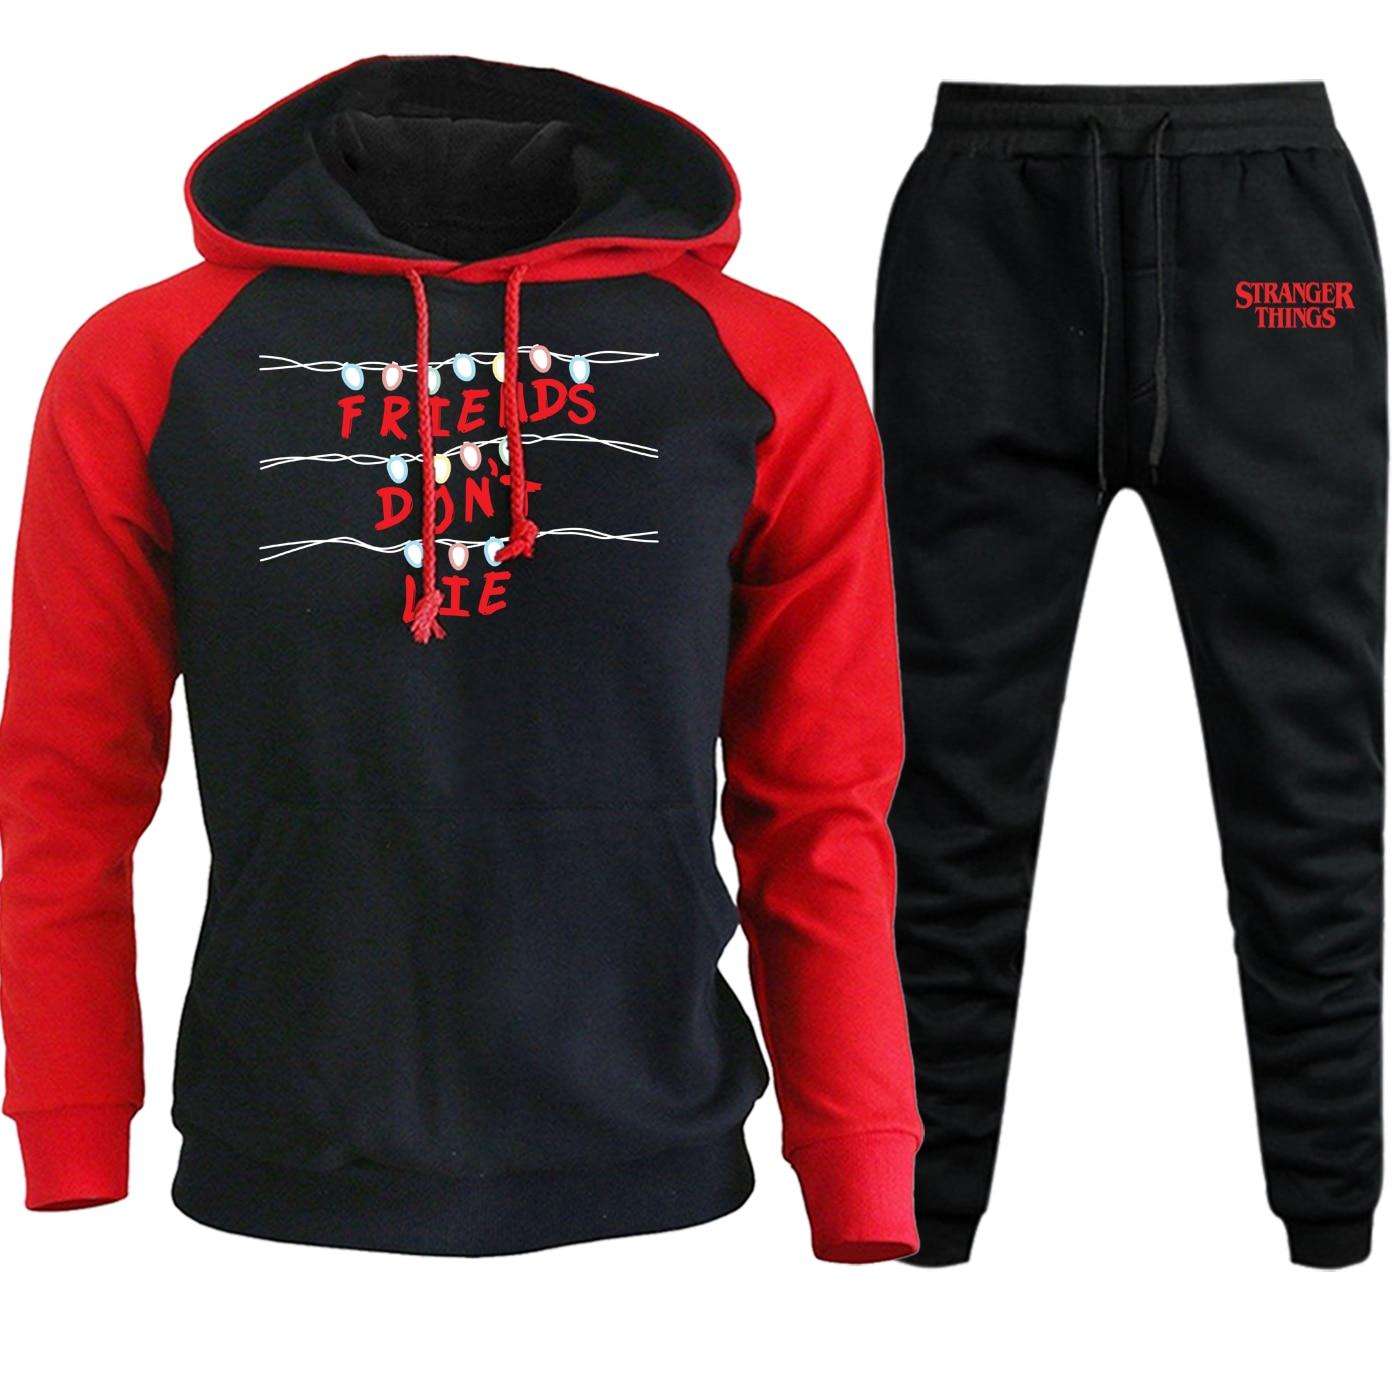 Autumn Winter 2019 Raglan Hoodies Mens Sweatshirts Stranger Things Vintage Print Suit Casual Hip Hop Pullover+Pants 2 Piece Set